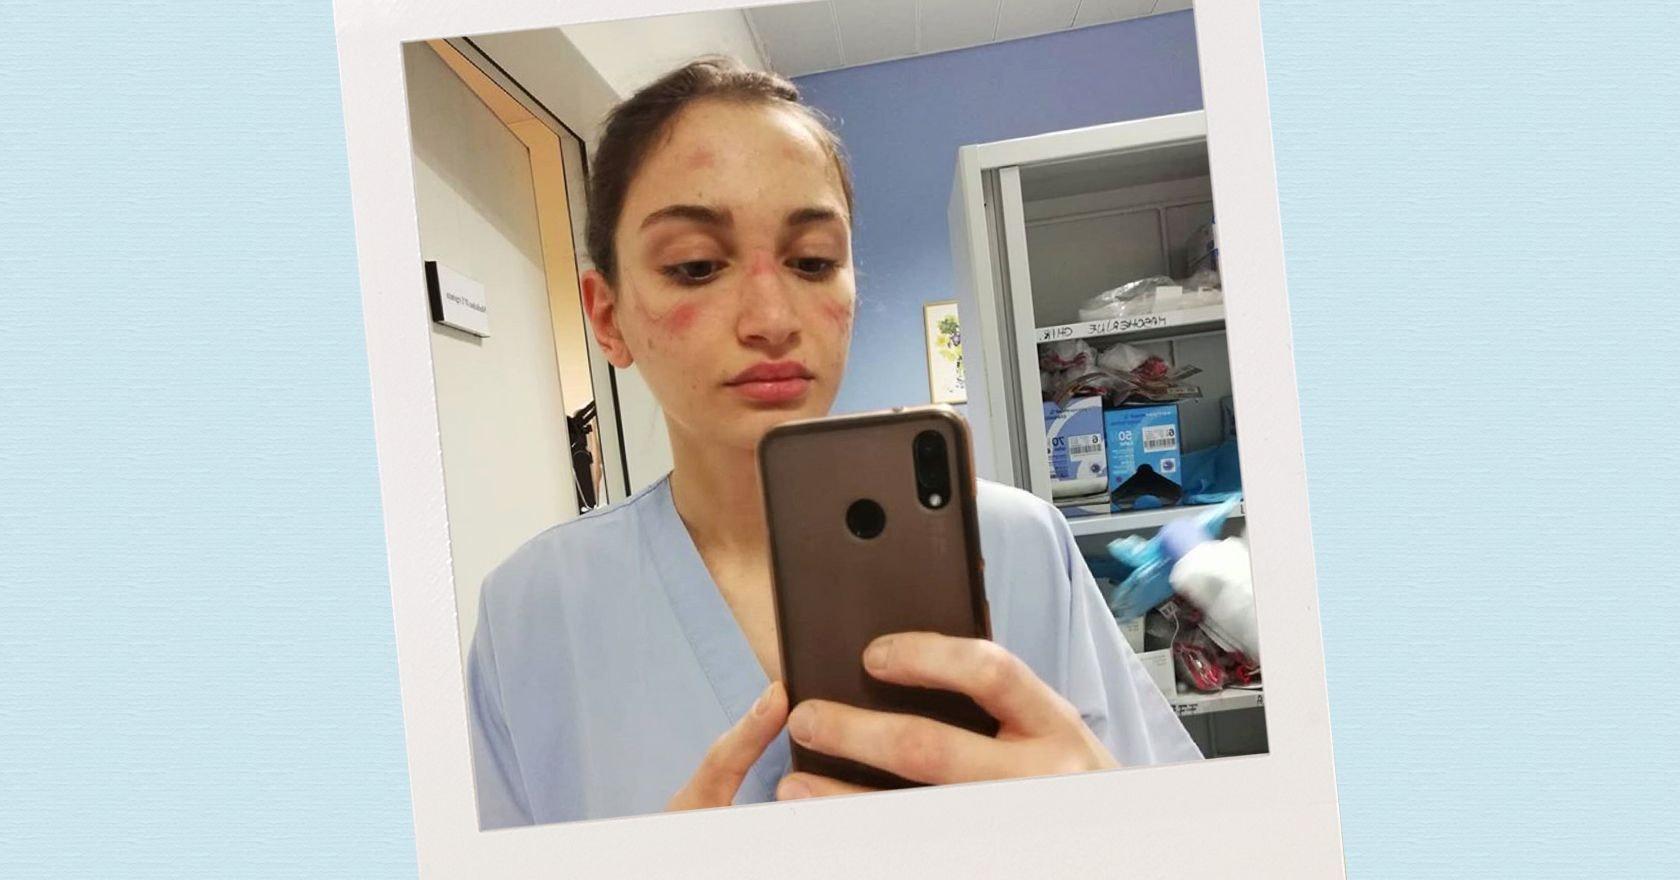 italian nurse u0026 39 s powerful  u0026quot coronavirus selfie u0026quot  goes viral